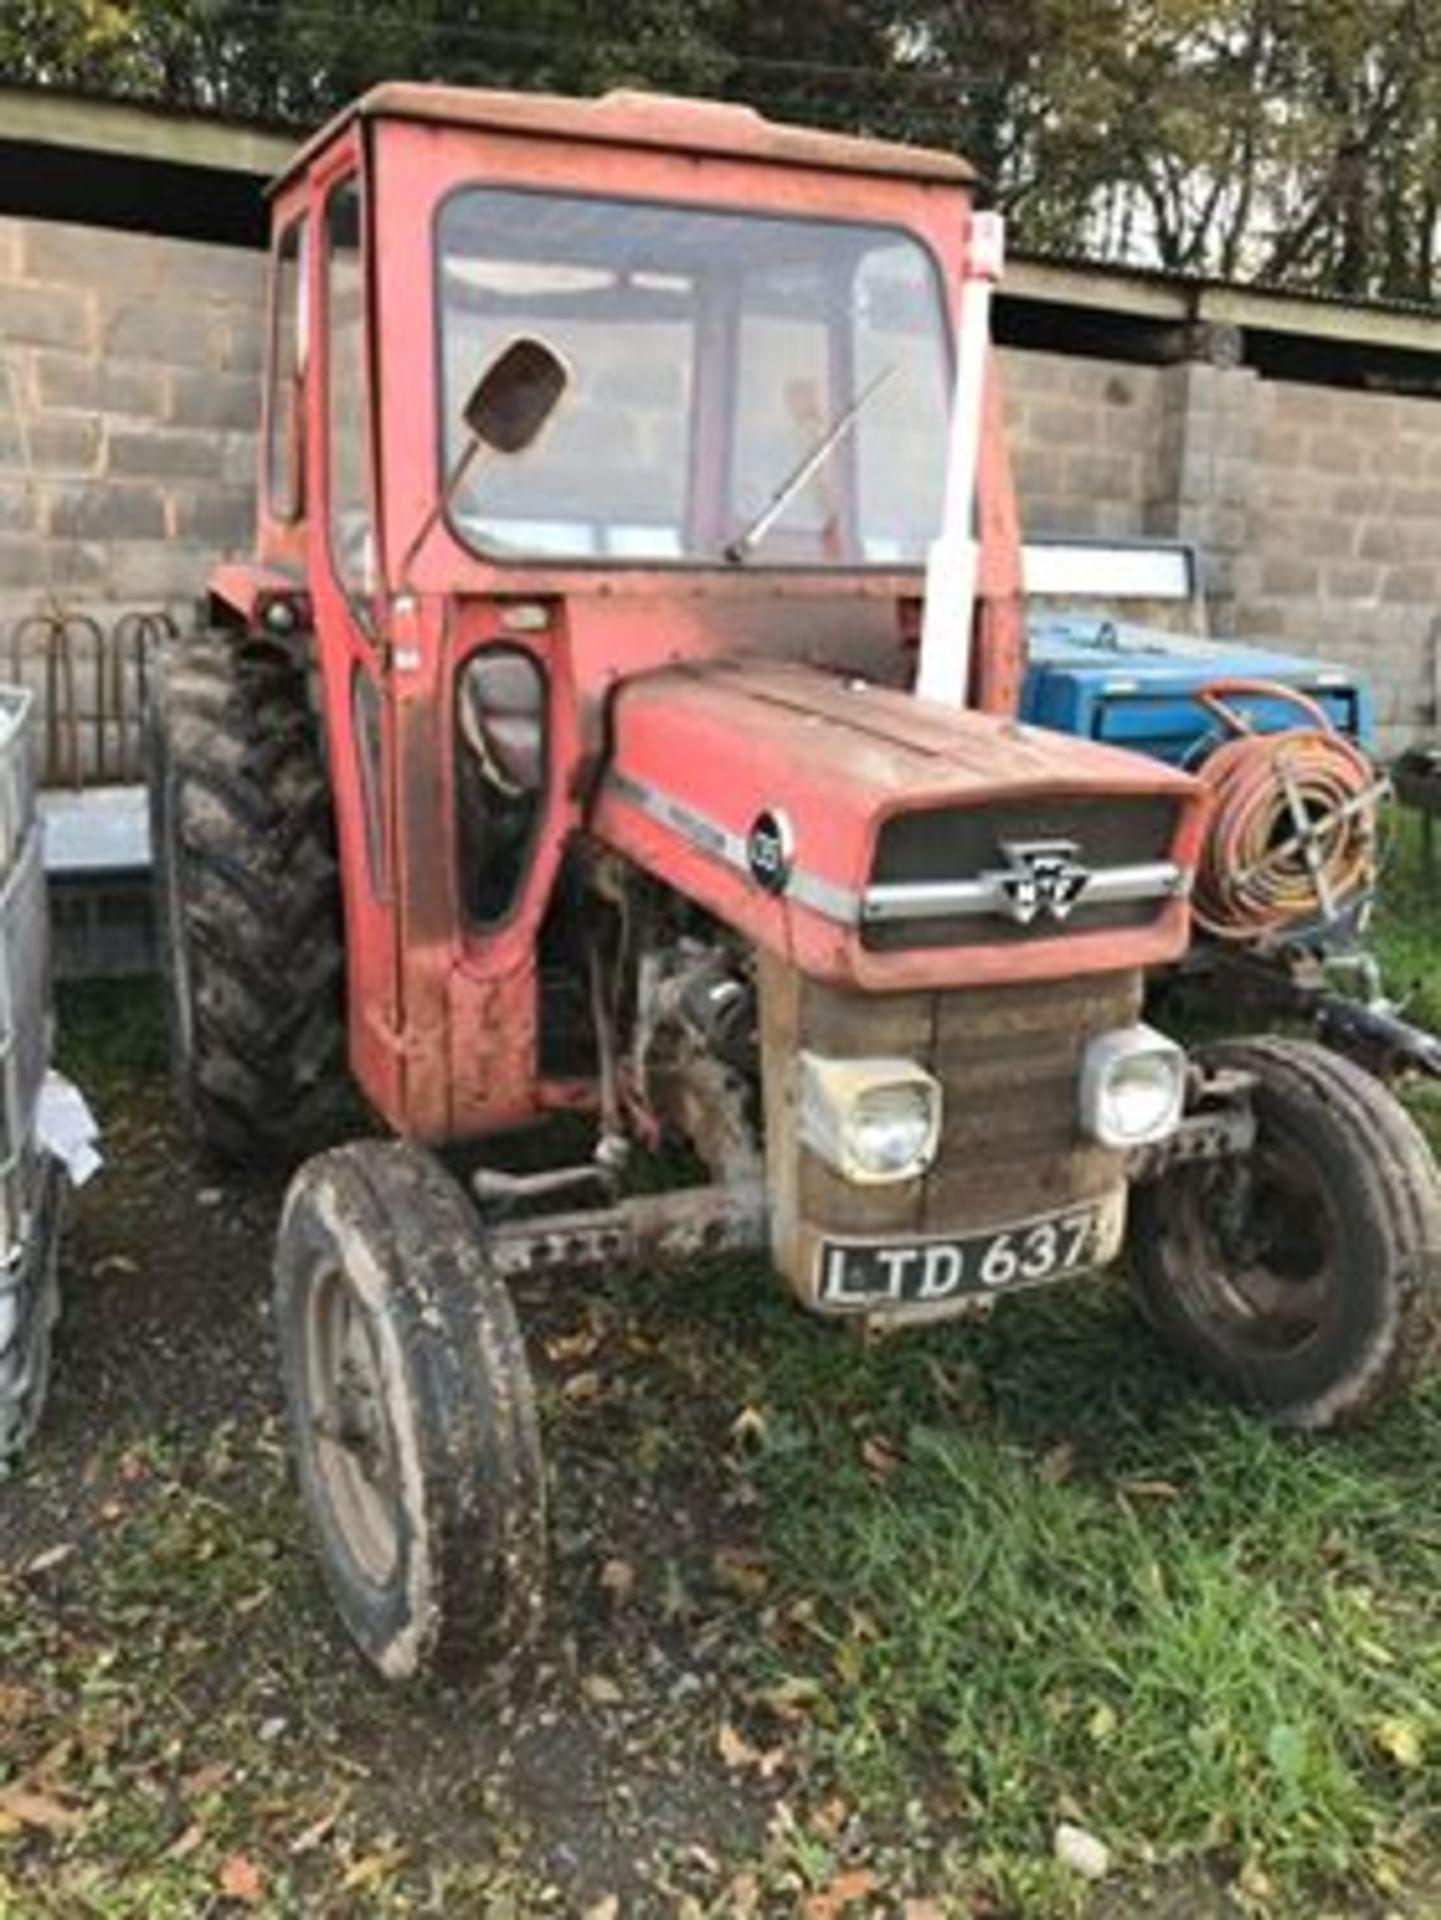 Lot 257 - MASSEY FERGUSON 135 2WD TRACTOR LTD 637